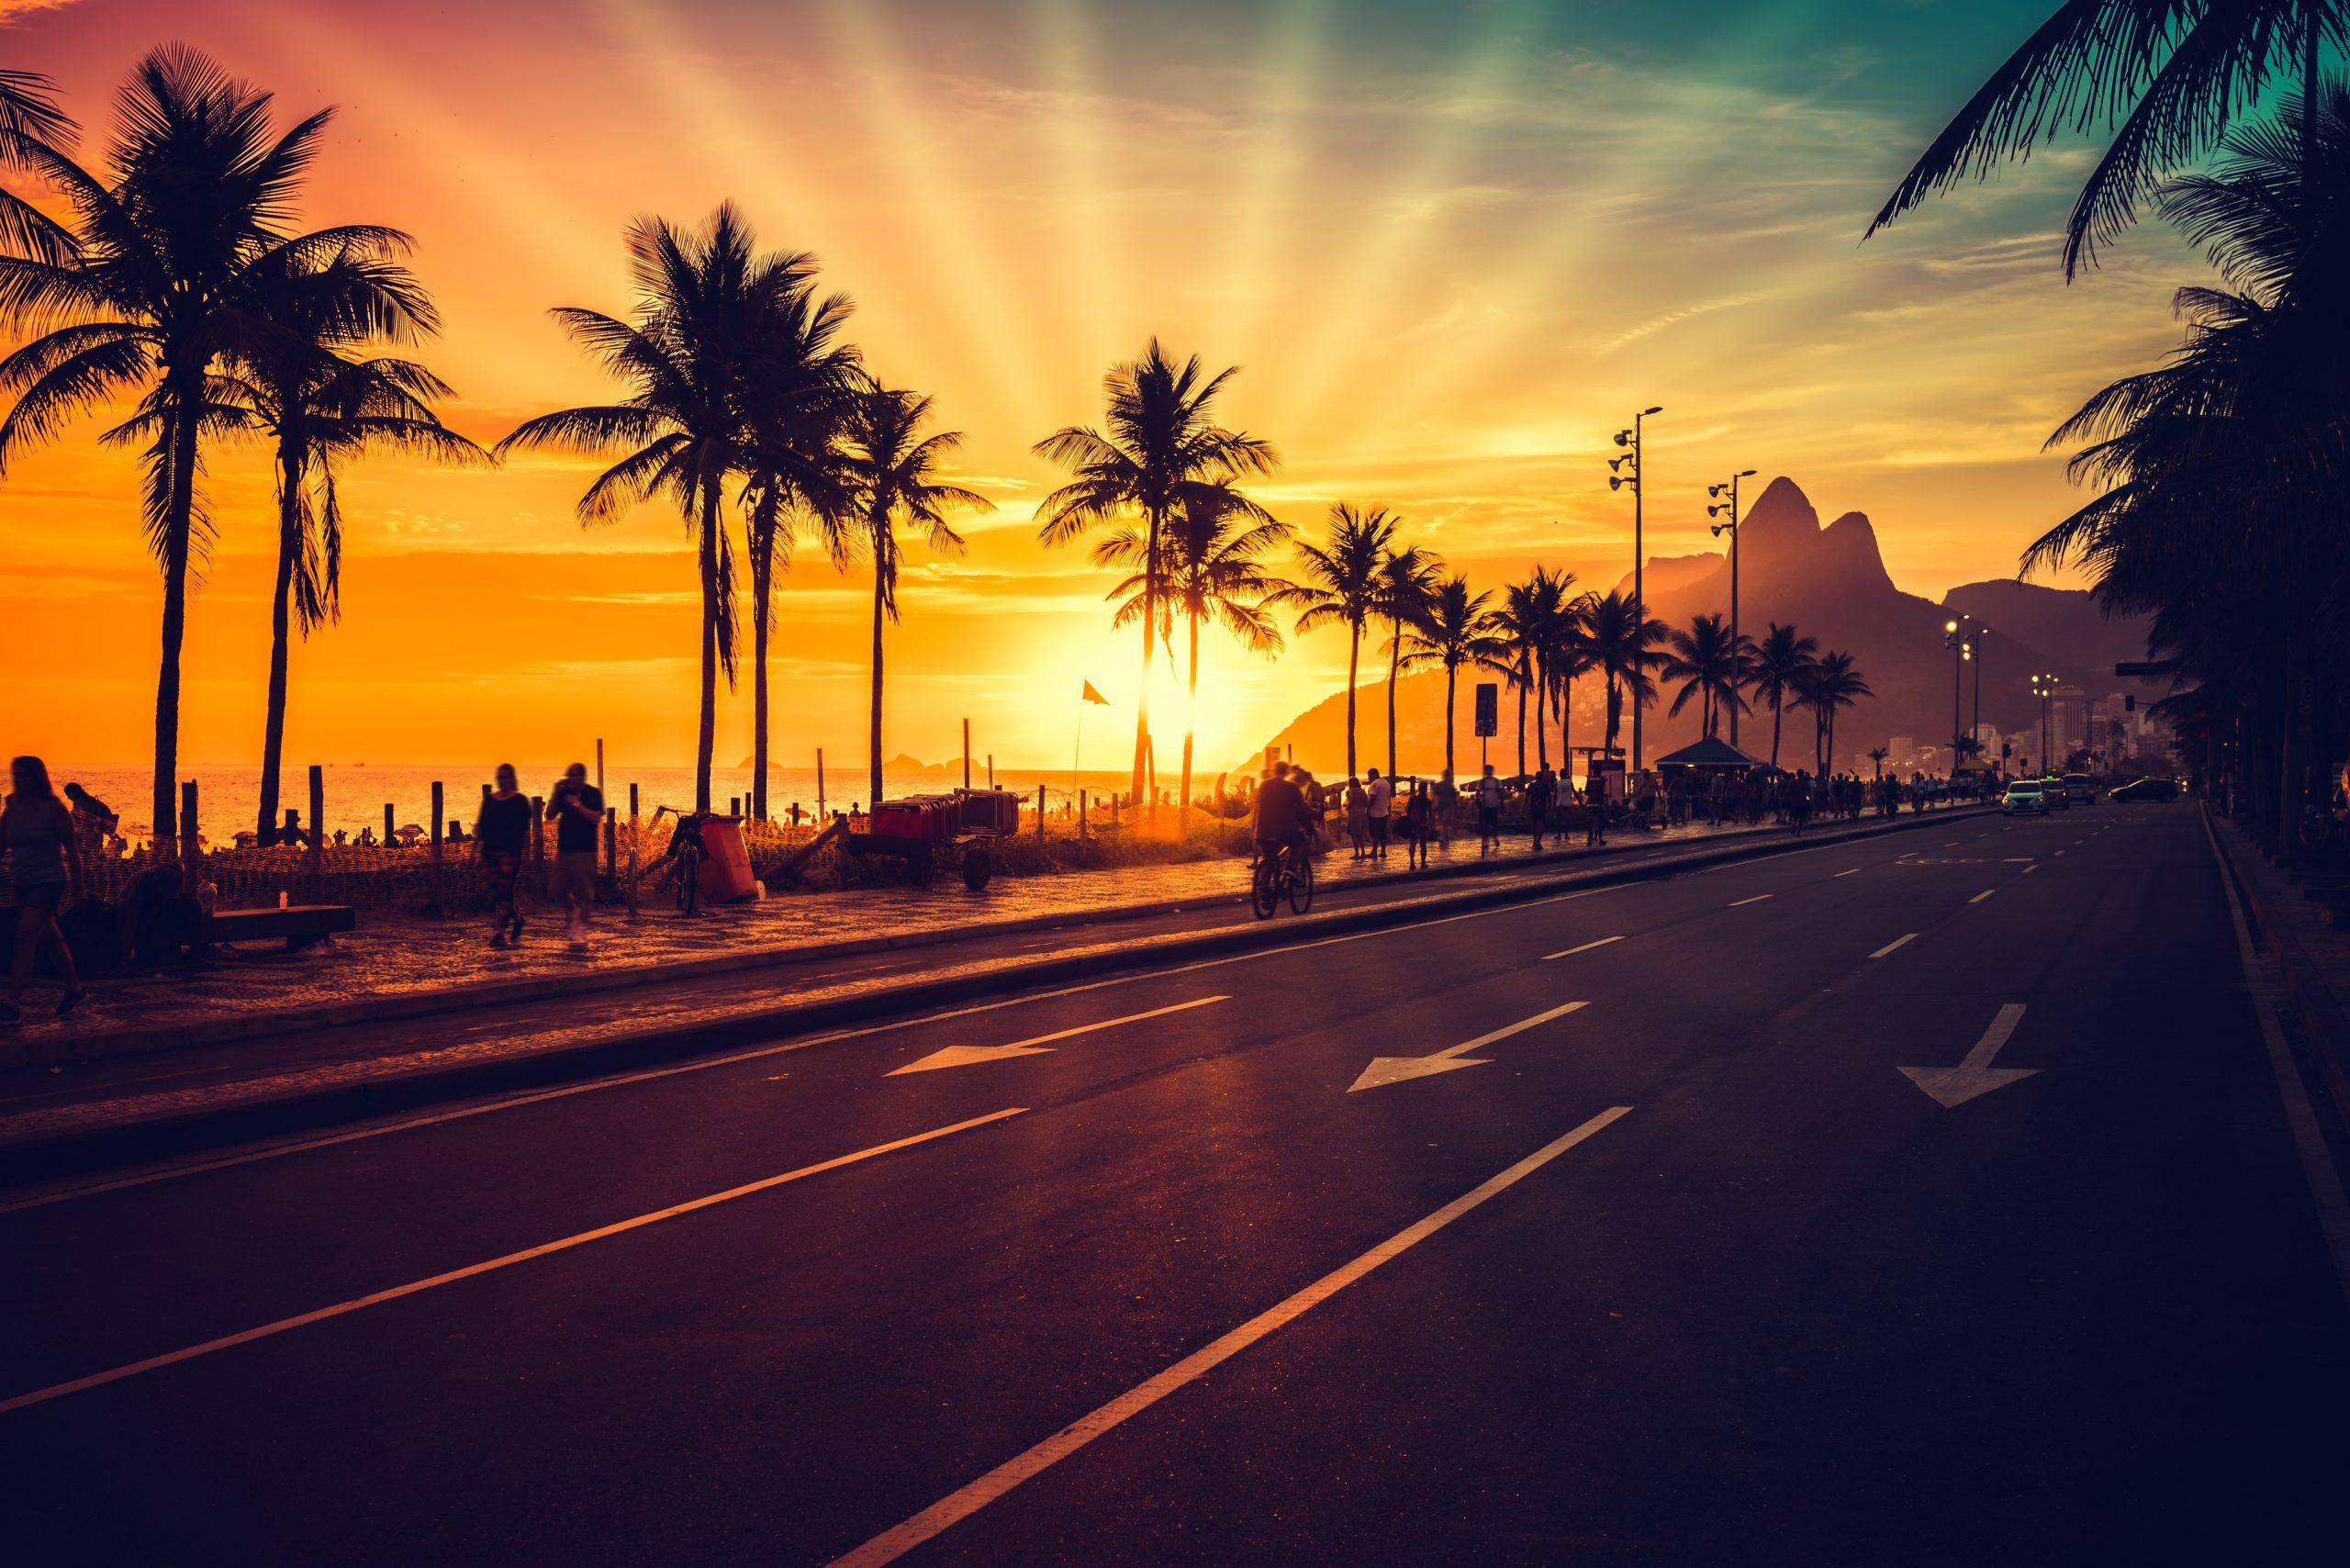 tramonto ipanema